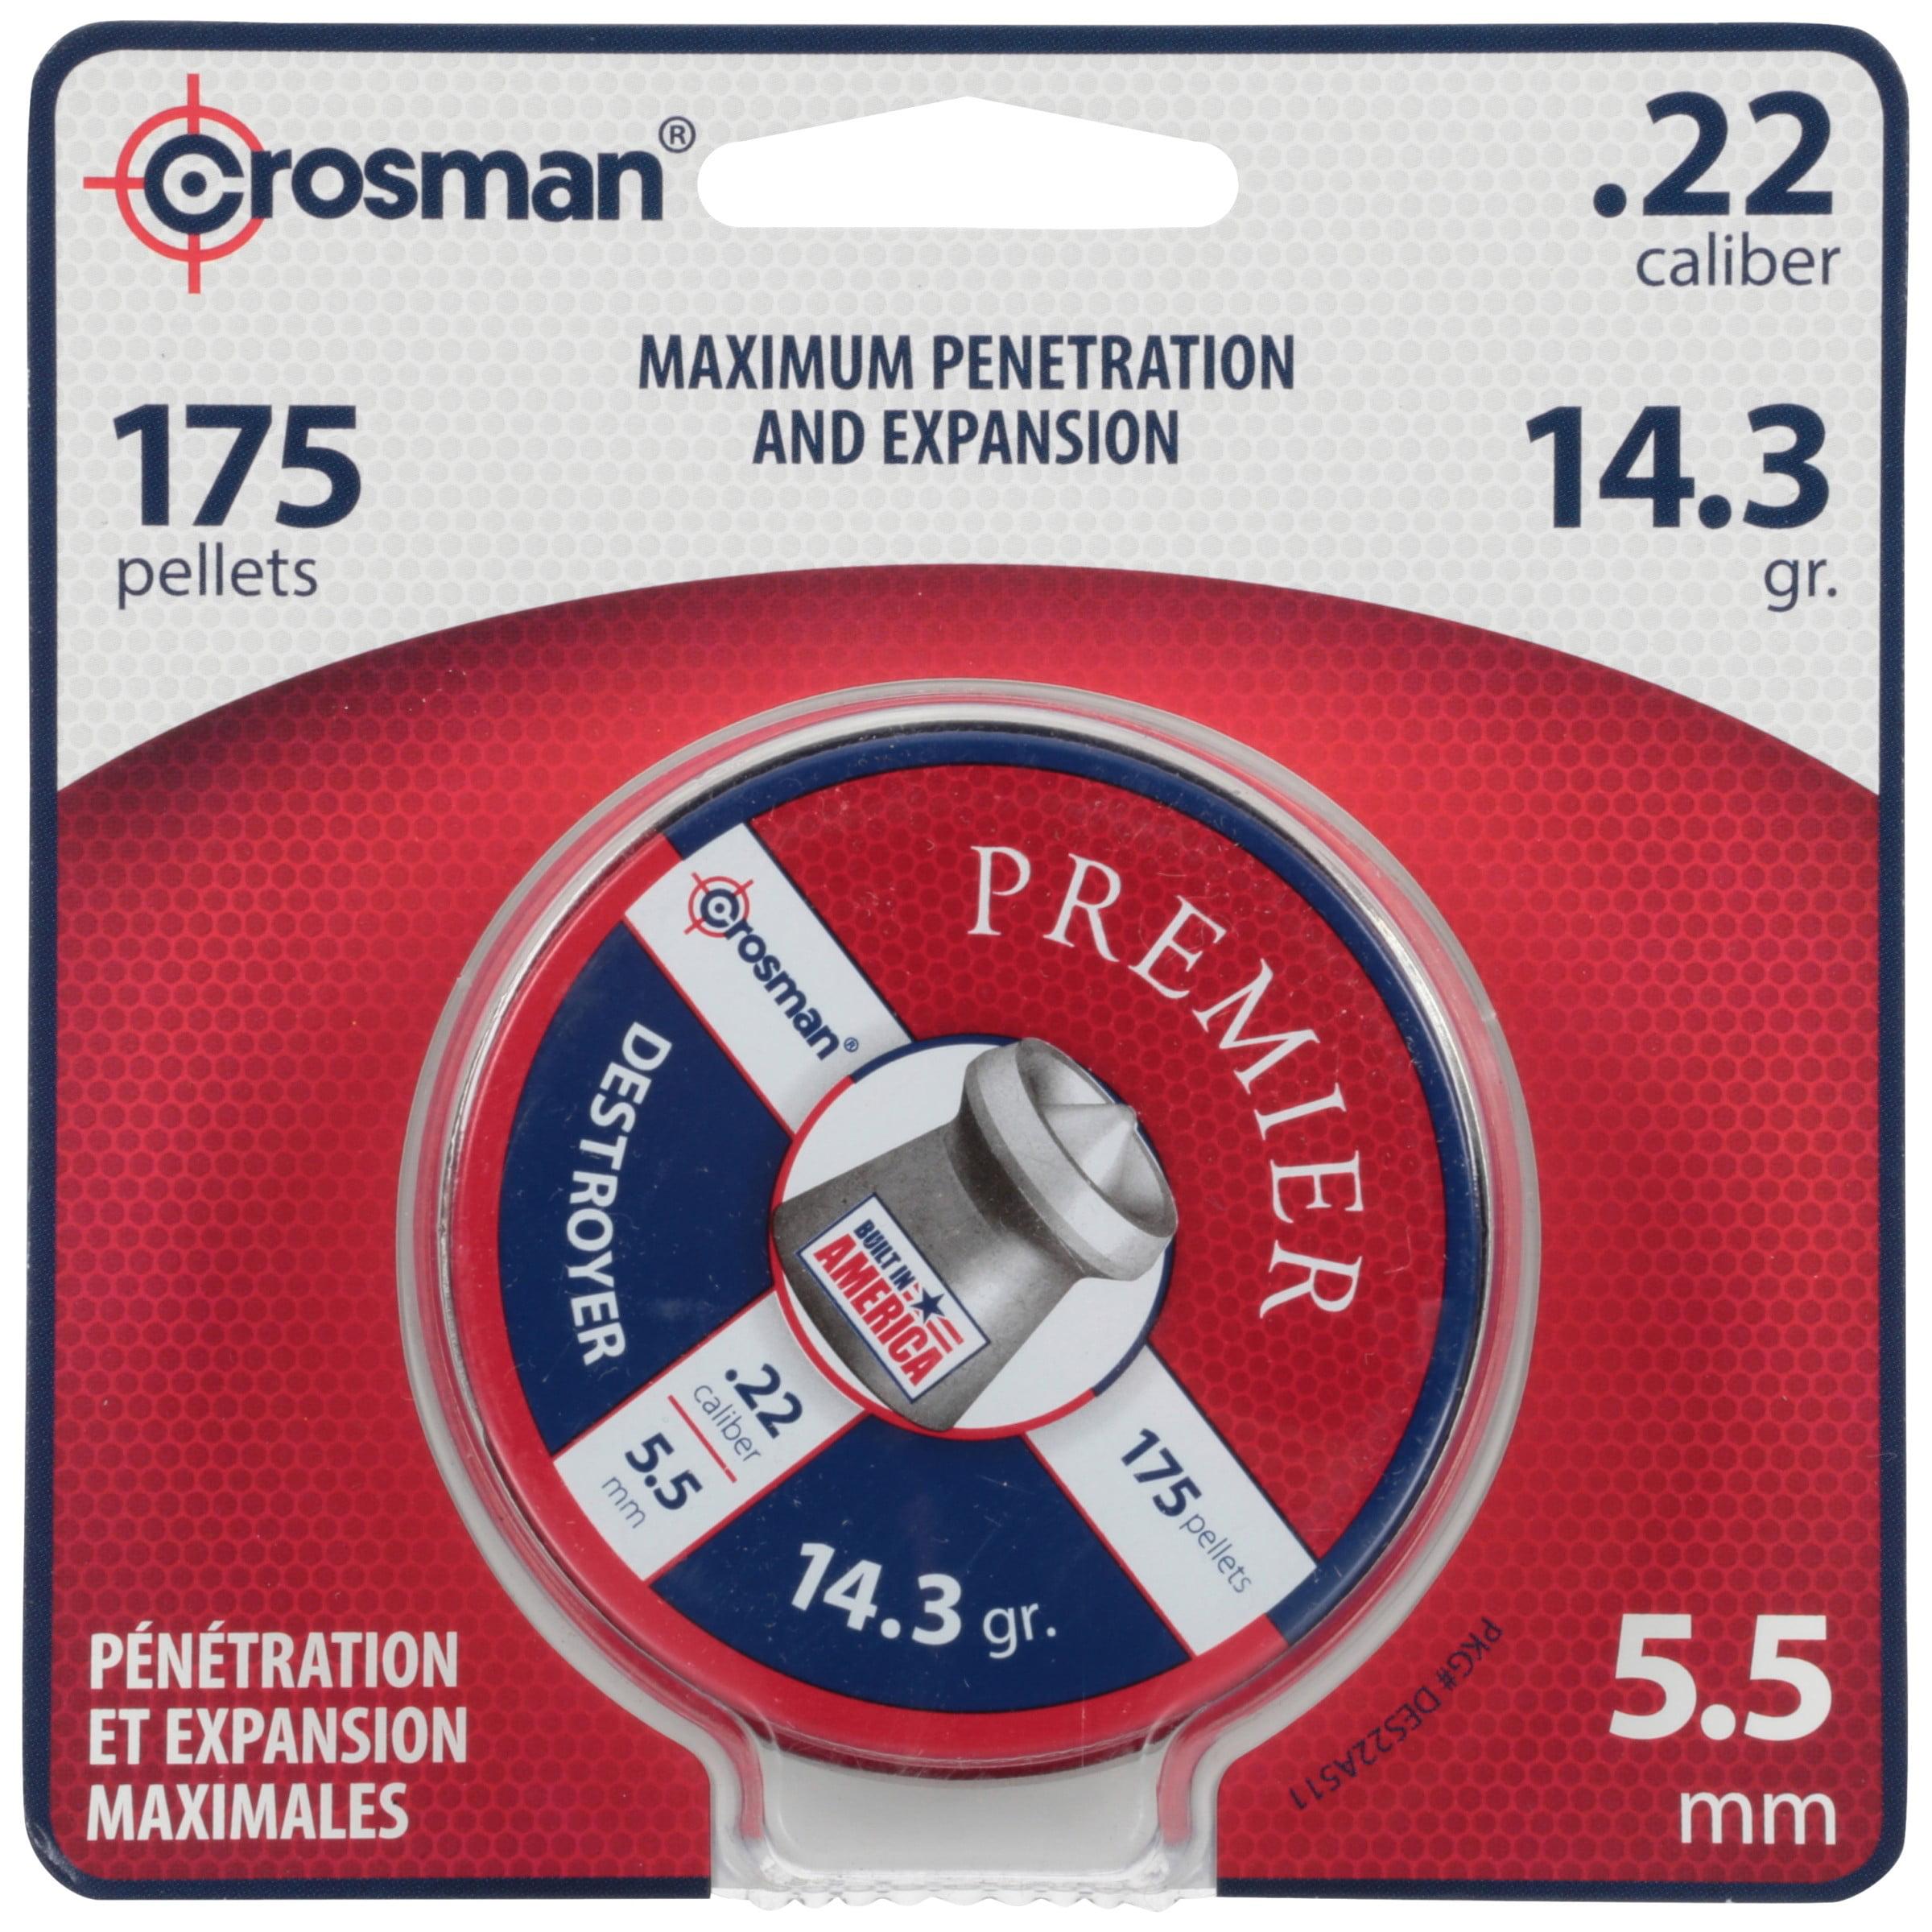 Crosman Destroyer Pellets 175 ct DES22 by Crosman